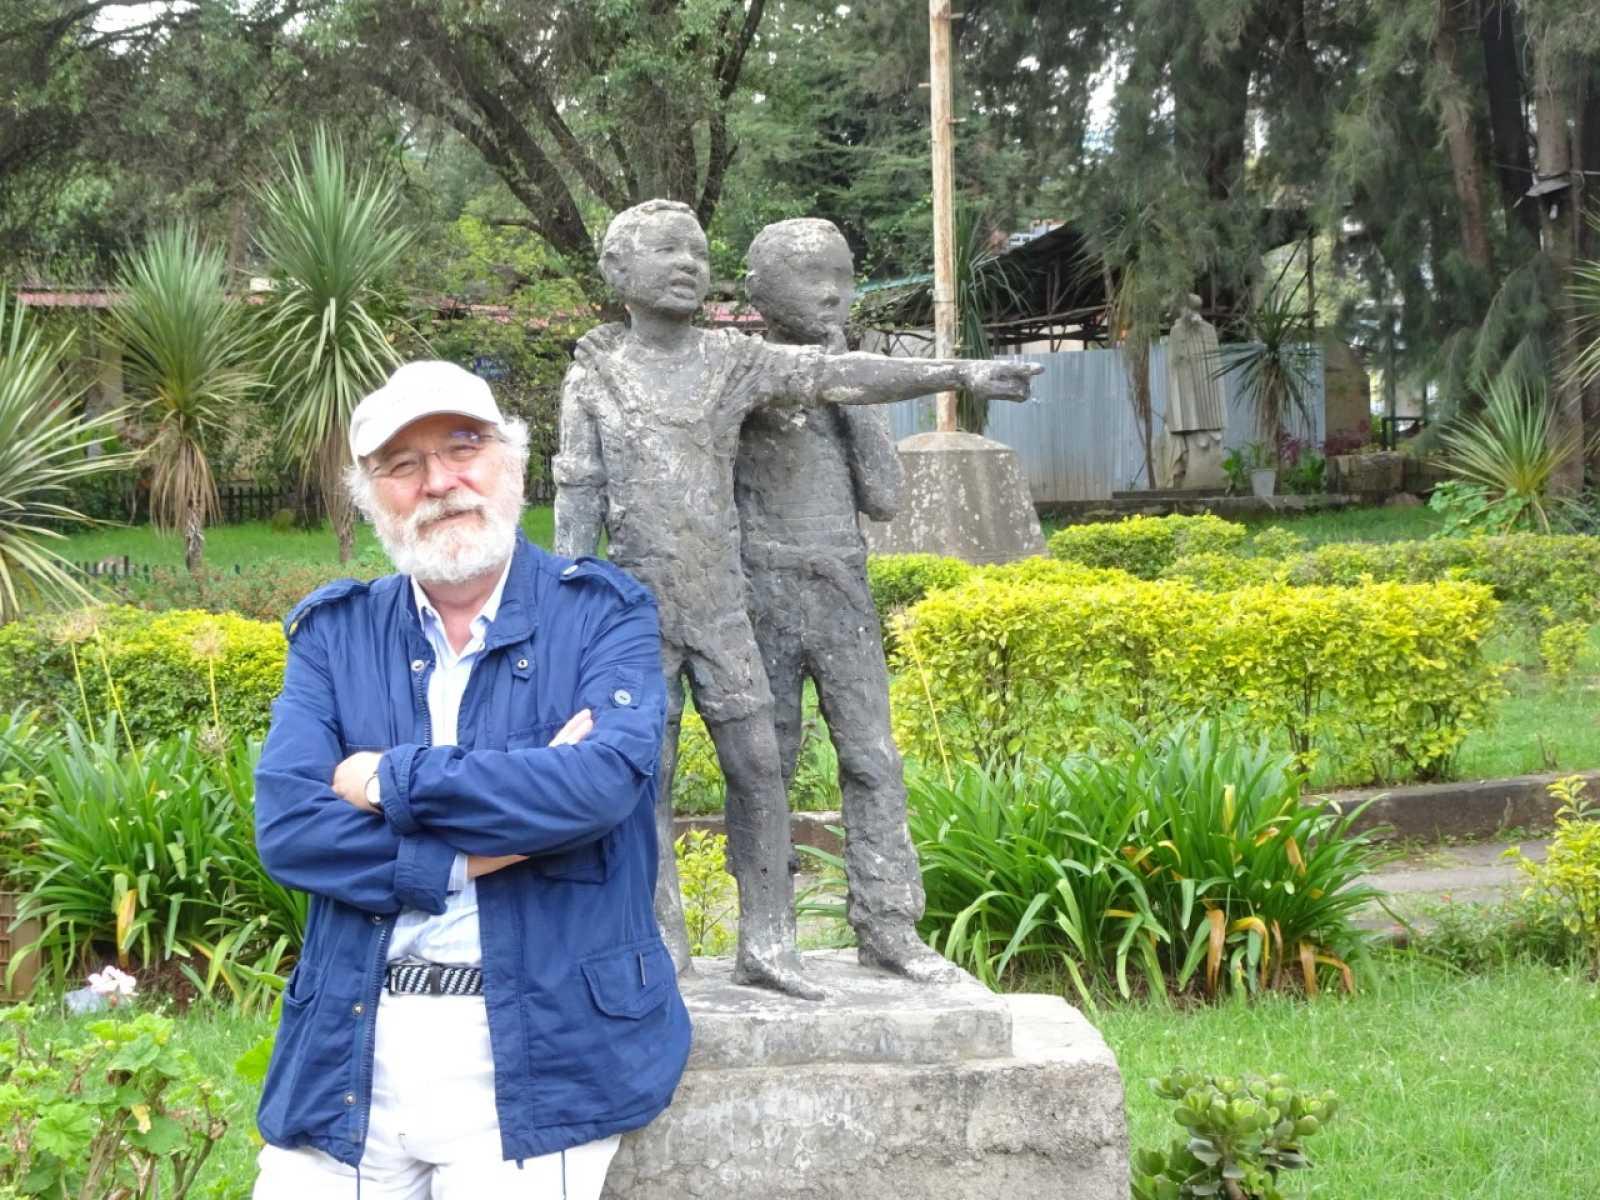 El placer de admirar - Juan Manuel García-Ruiz - 13/03/21 - escuchar ahora